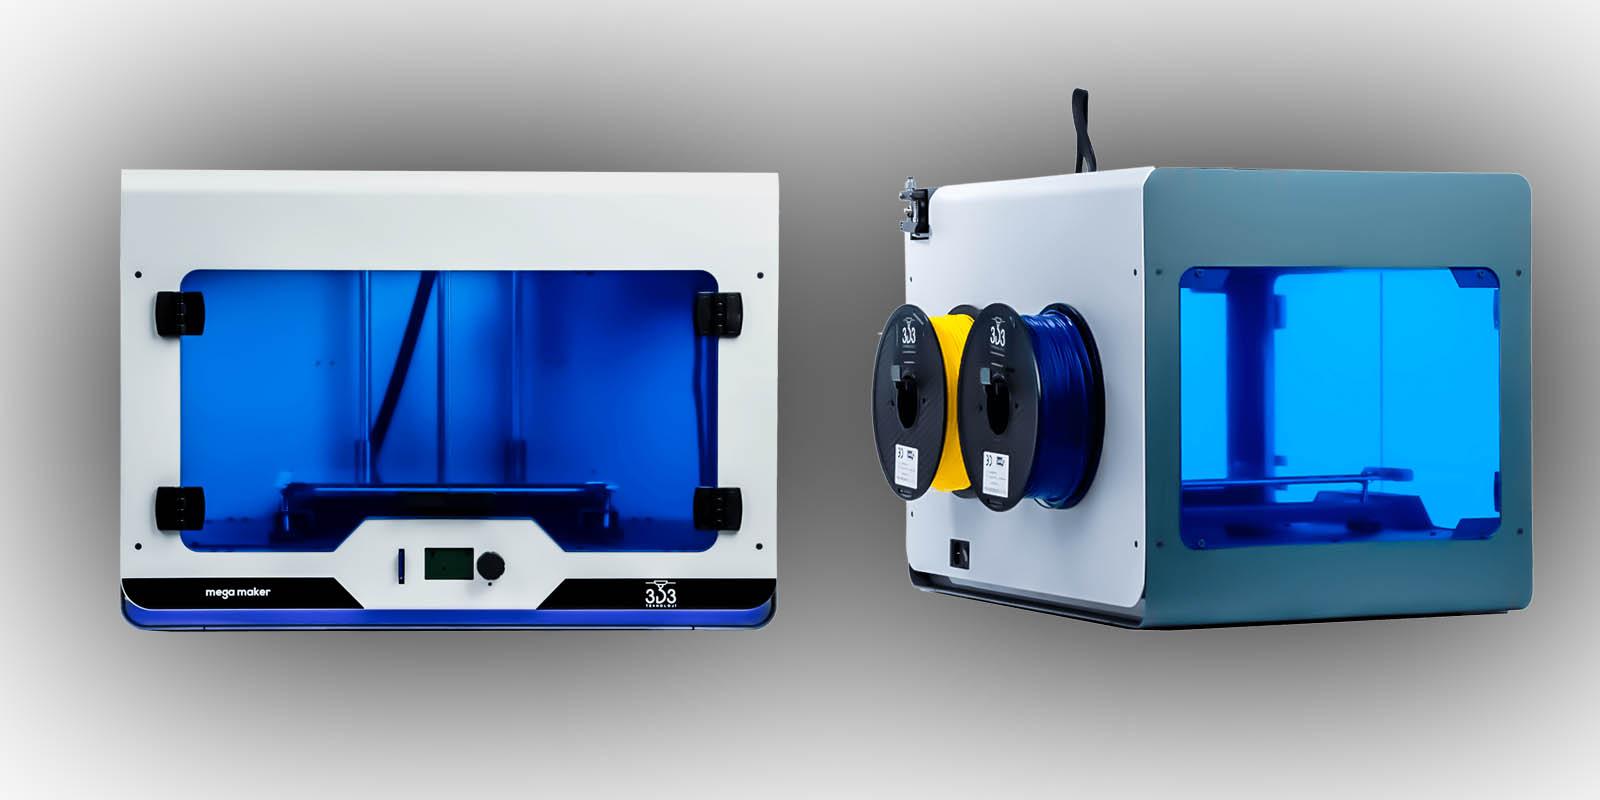 3D3 Teknoloji'nin kendi üretimi olan MegaMaker